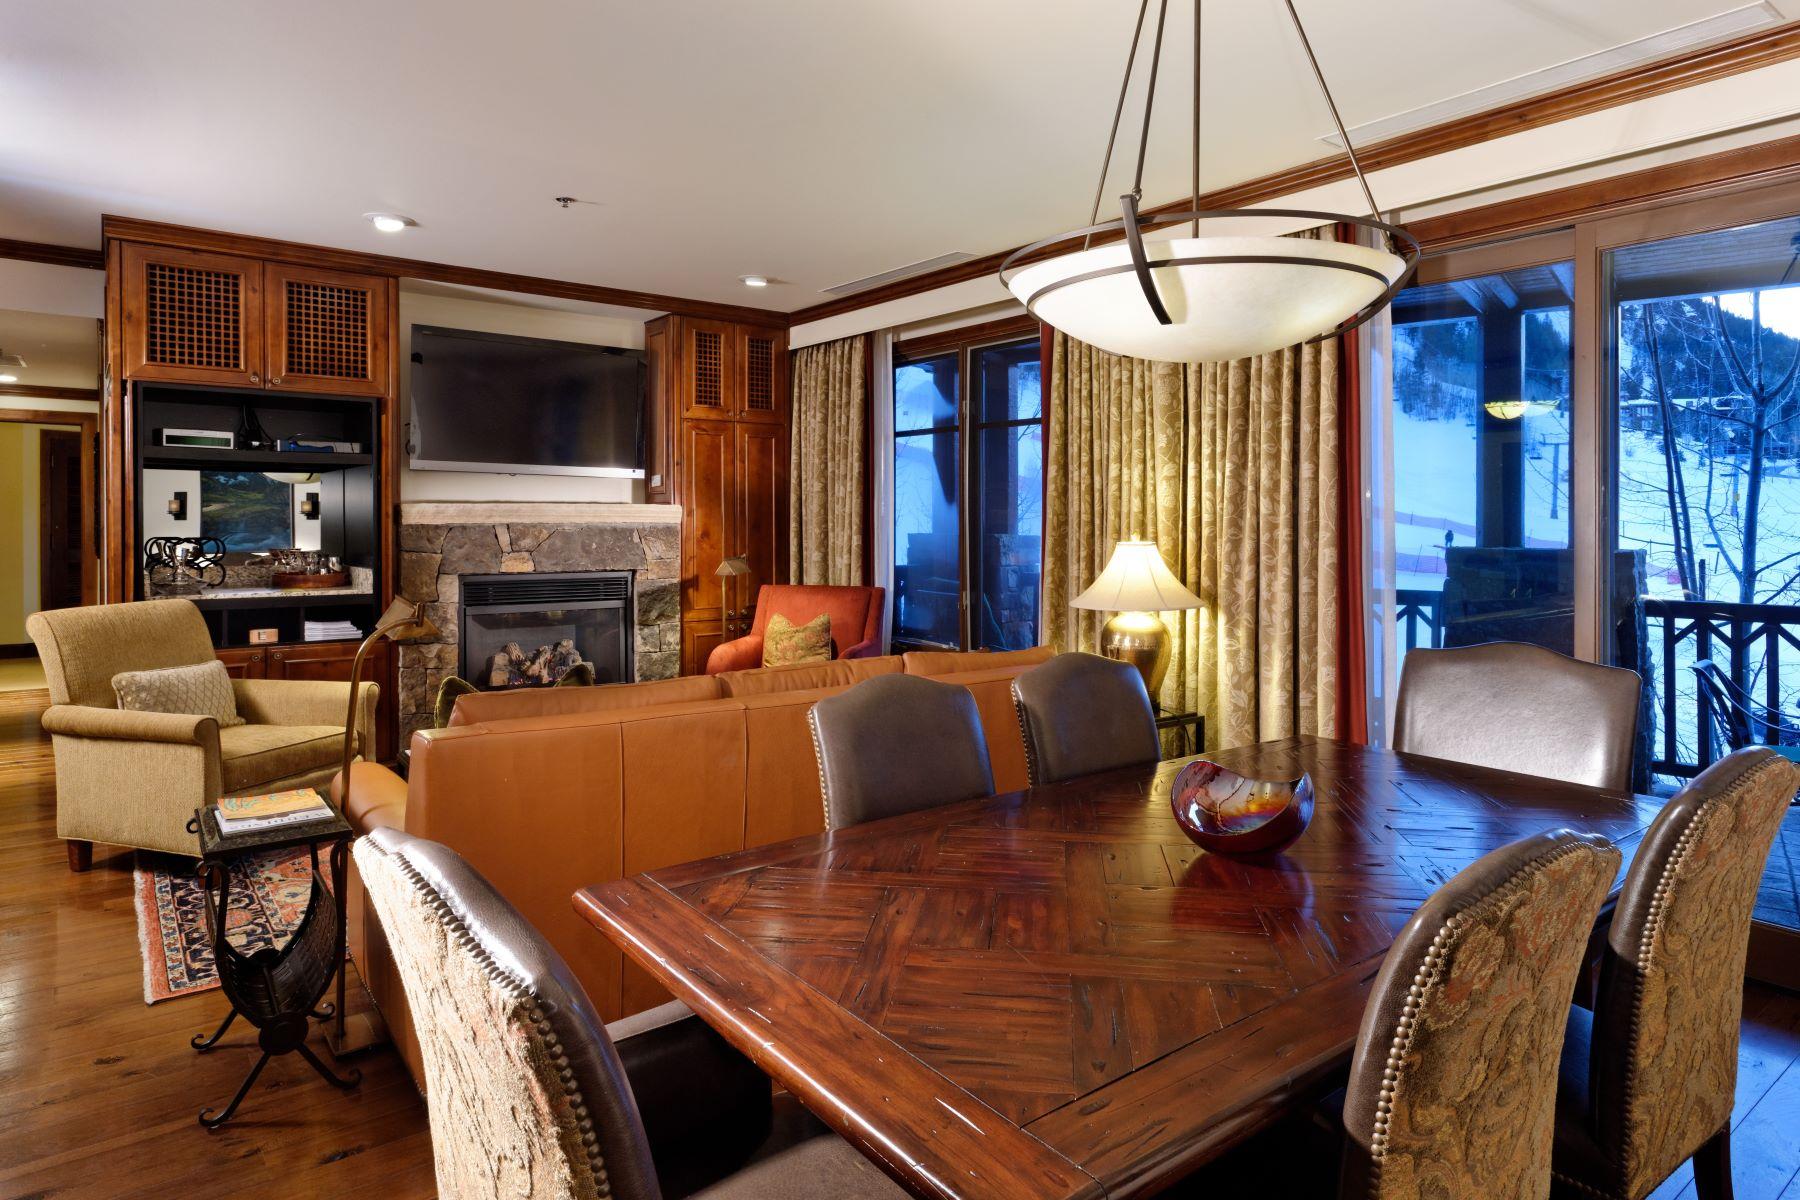 部分所有權 為 出售 在 Ritz-Carlton Club Fractional Condo Interest 0075 Prospector Road Unit 8104, Interest 1, Aspen, 科羅拉多州, 81611 美國